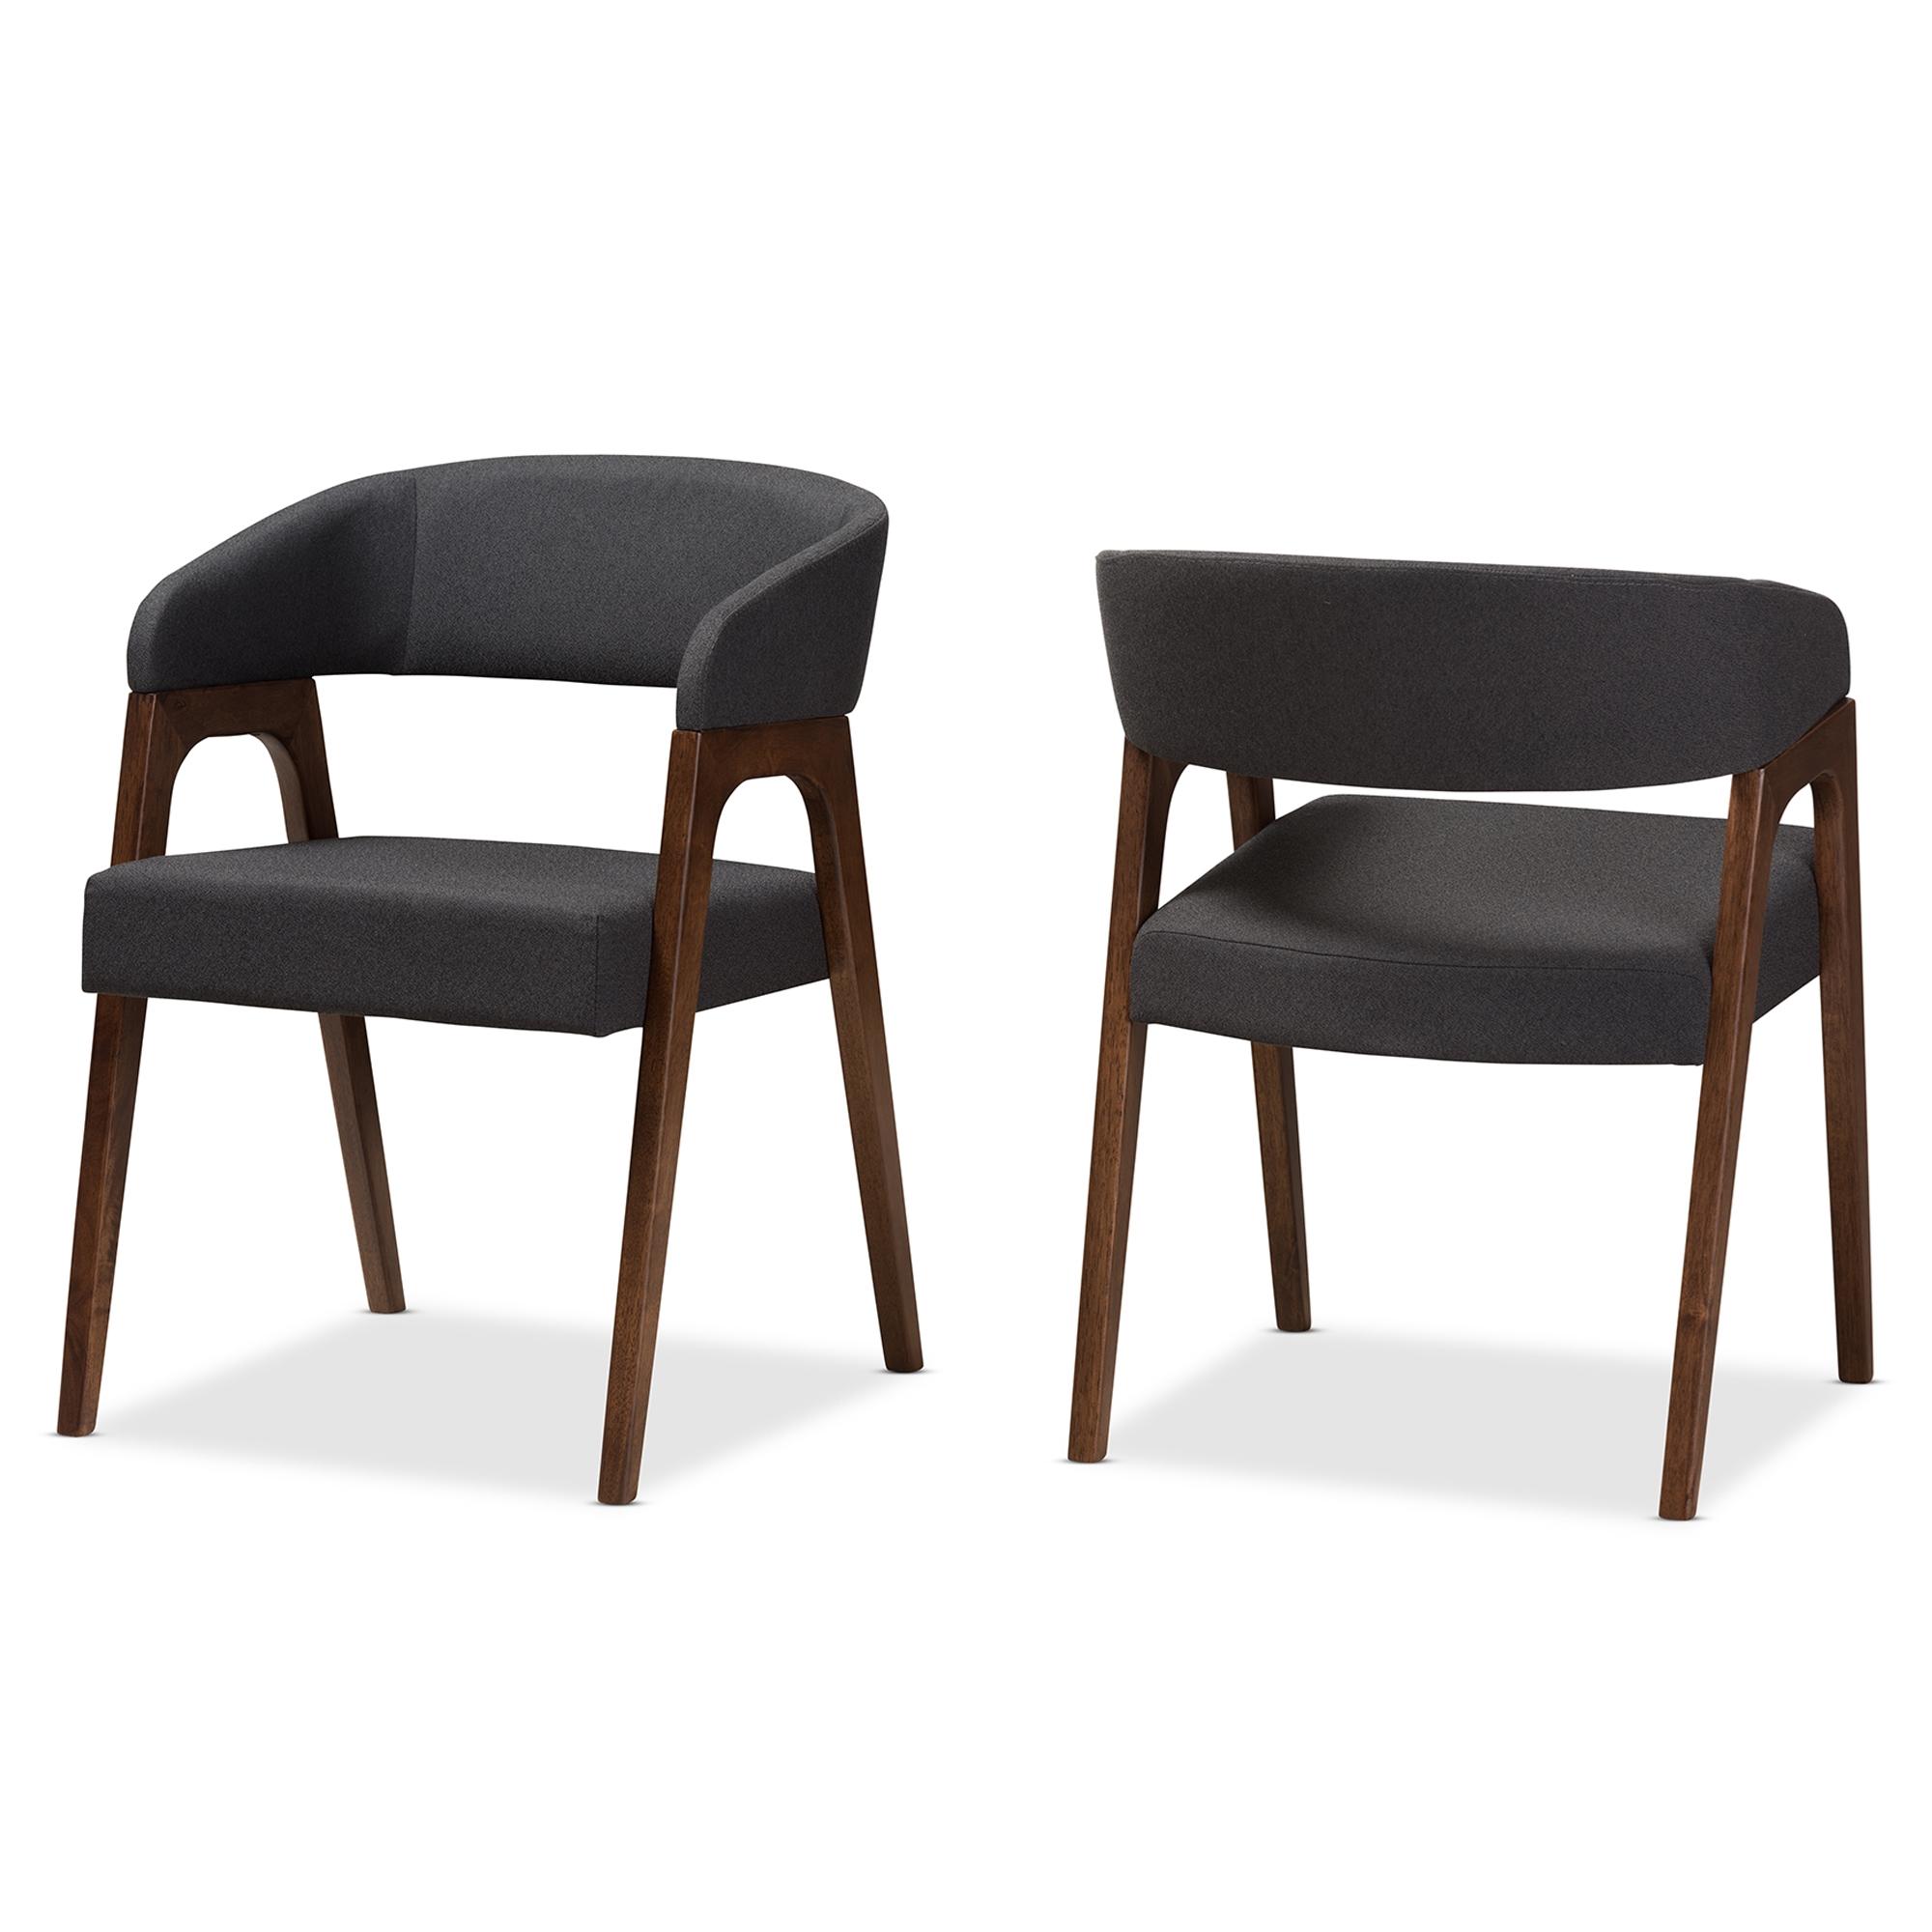 Great Baxton Studio Tory Mid Century Modern Walnut Wood Dark Grey Fabric Dining  Chair Set Of